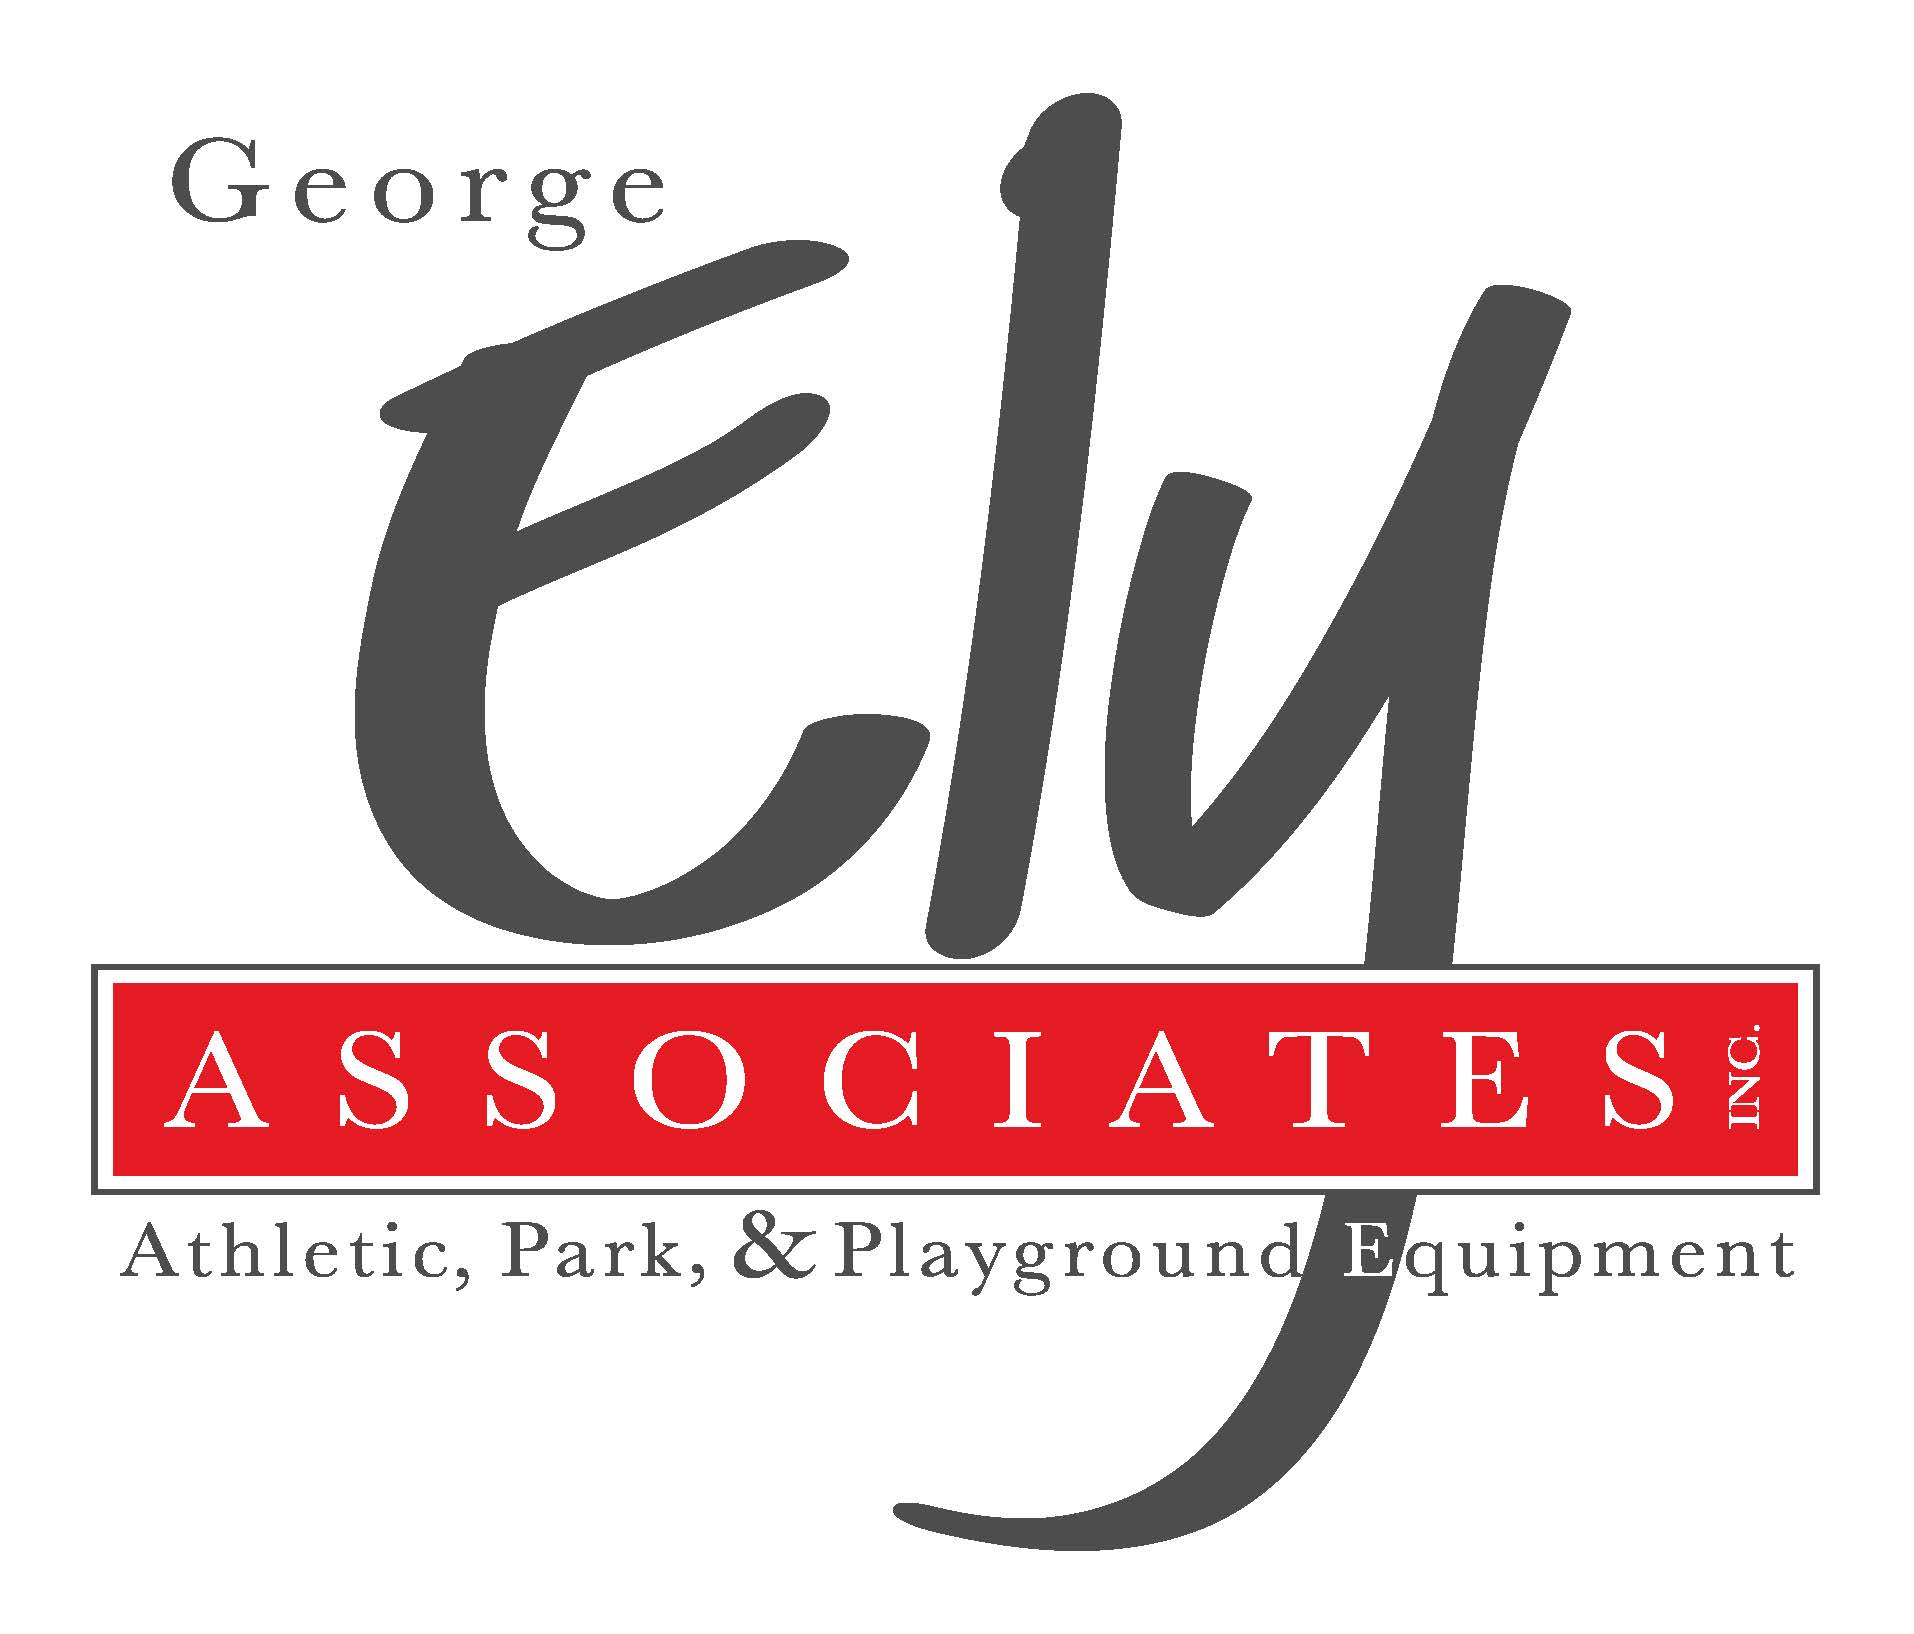 George Ely Associates